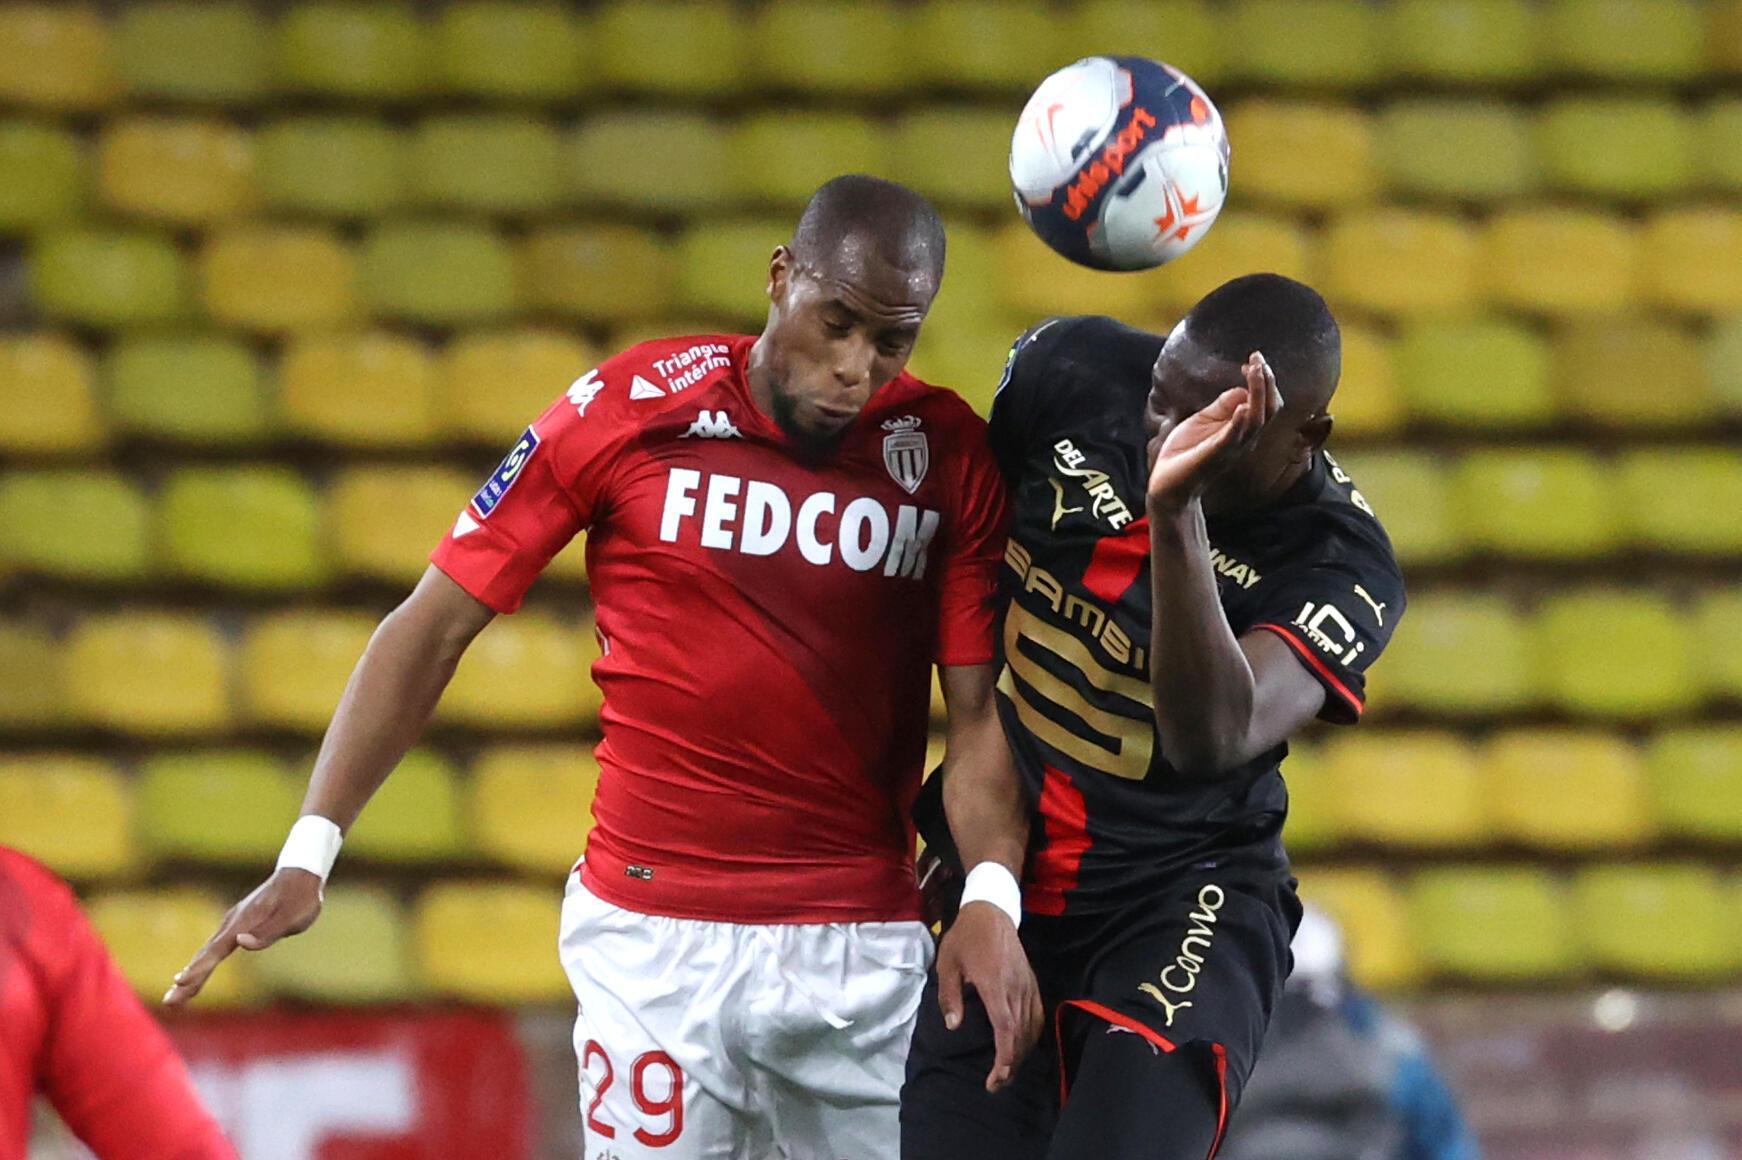 Monegasque defender Djibril Sidibé, wrestling with Rennes striker Serhou Guirassy, during their Ligue 1 match, on May 16, 2021 at Stade Louis II